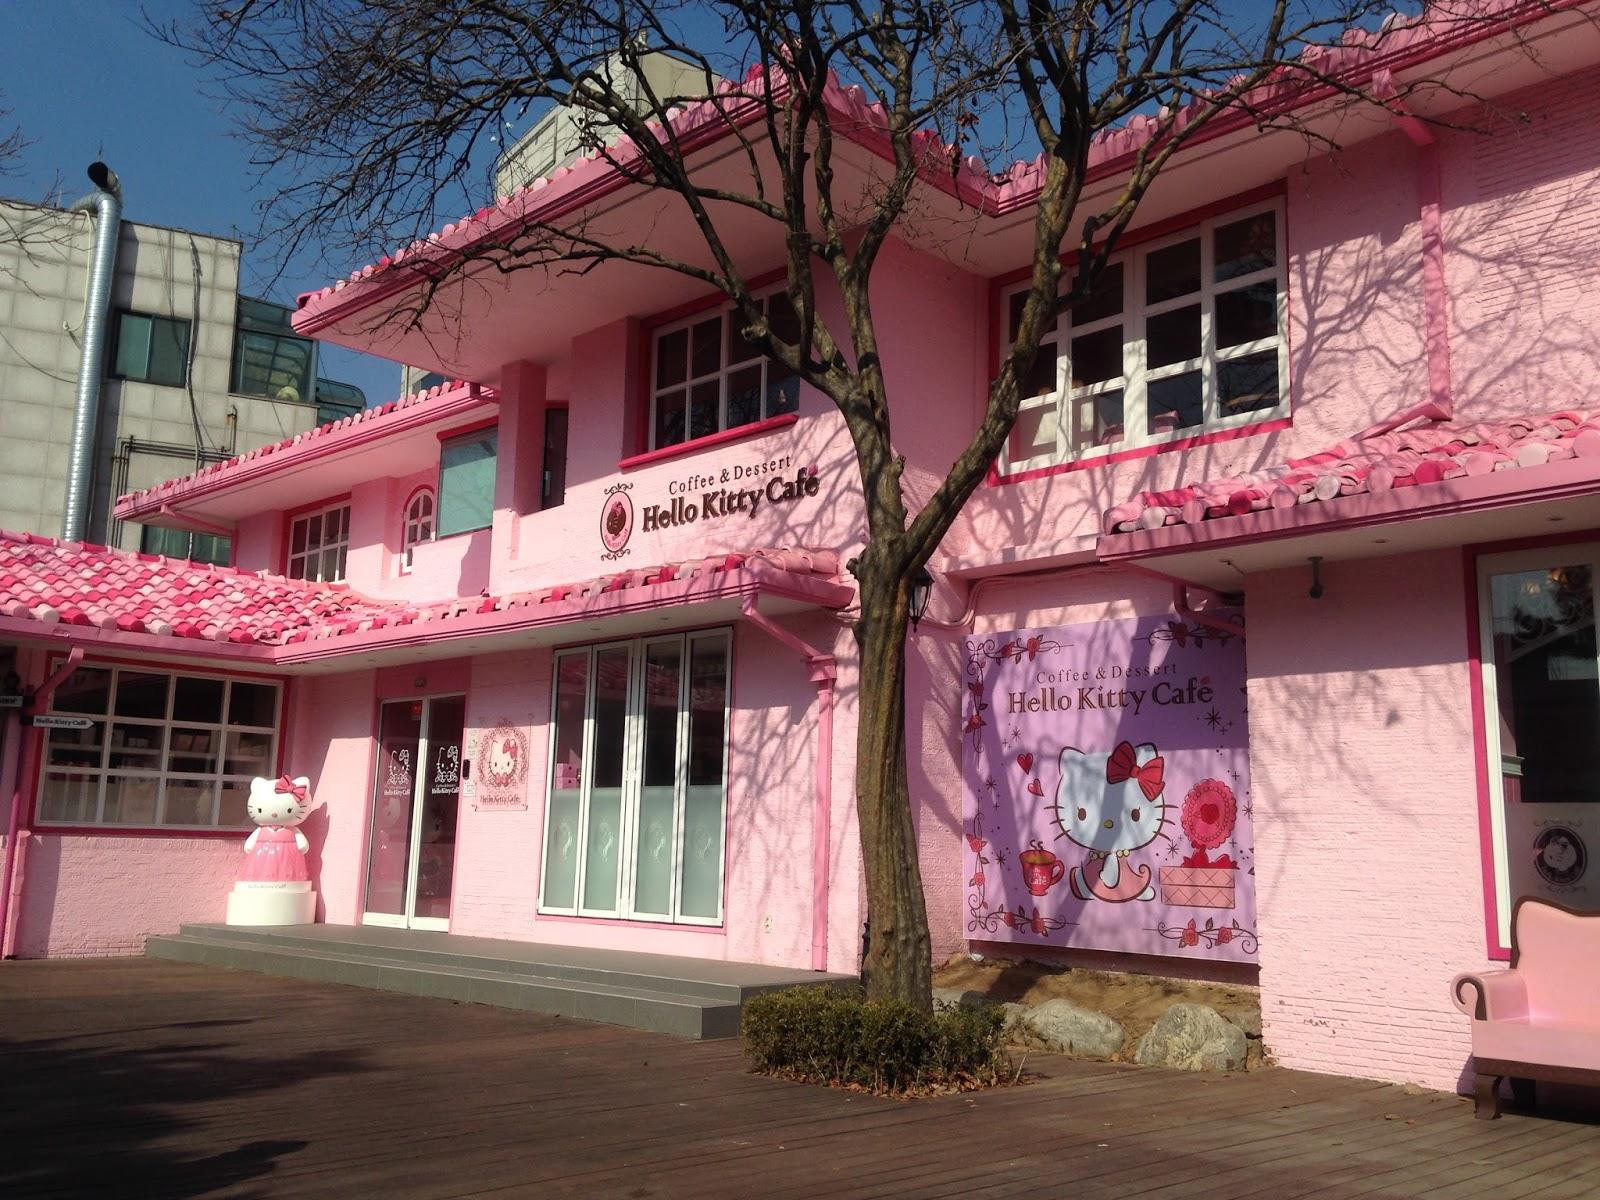 Hello Kitty Houses Real Houses trip to korea 2015 : day 5 (hello kitty cafe, itaewon mosque